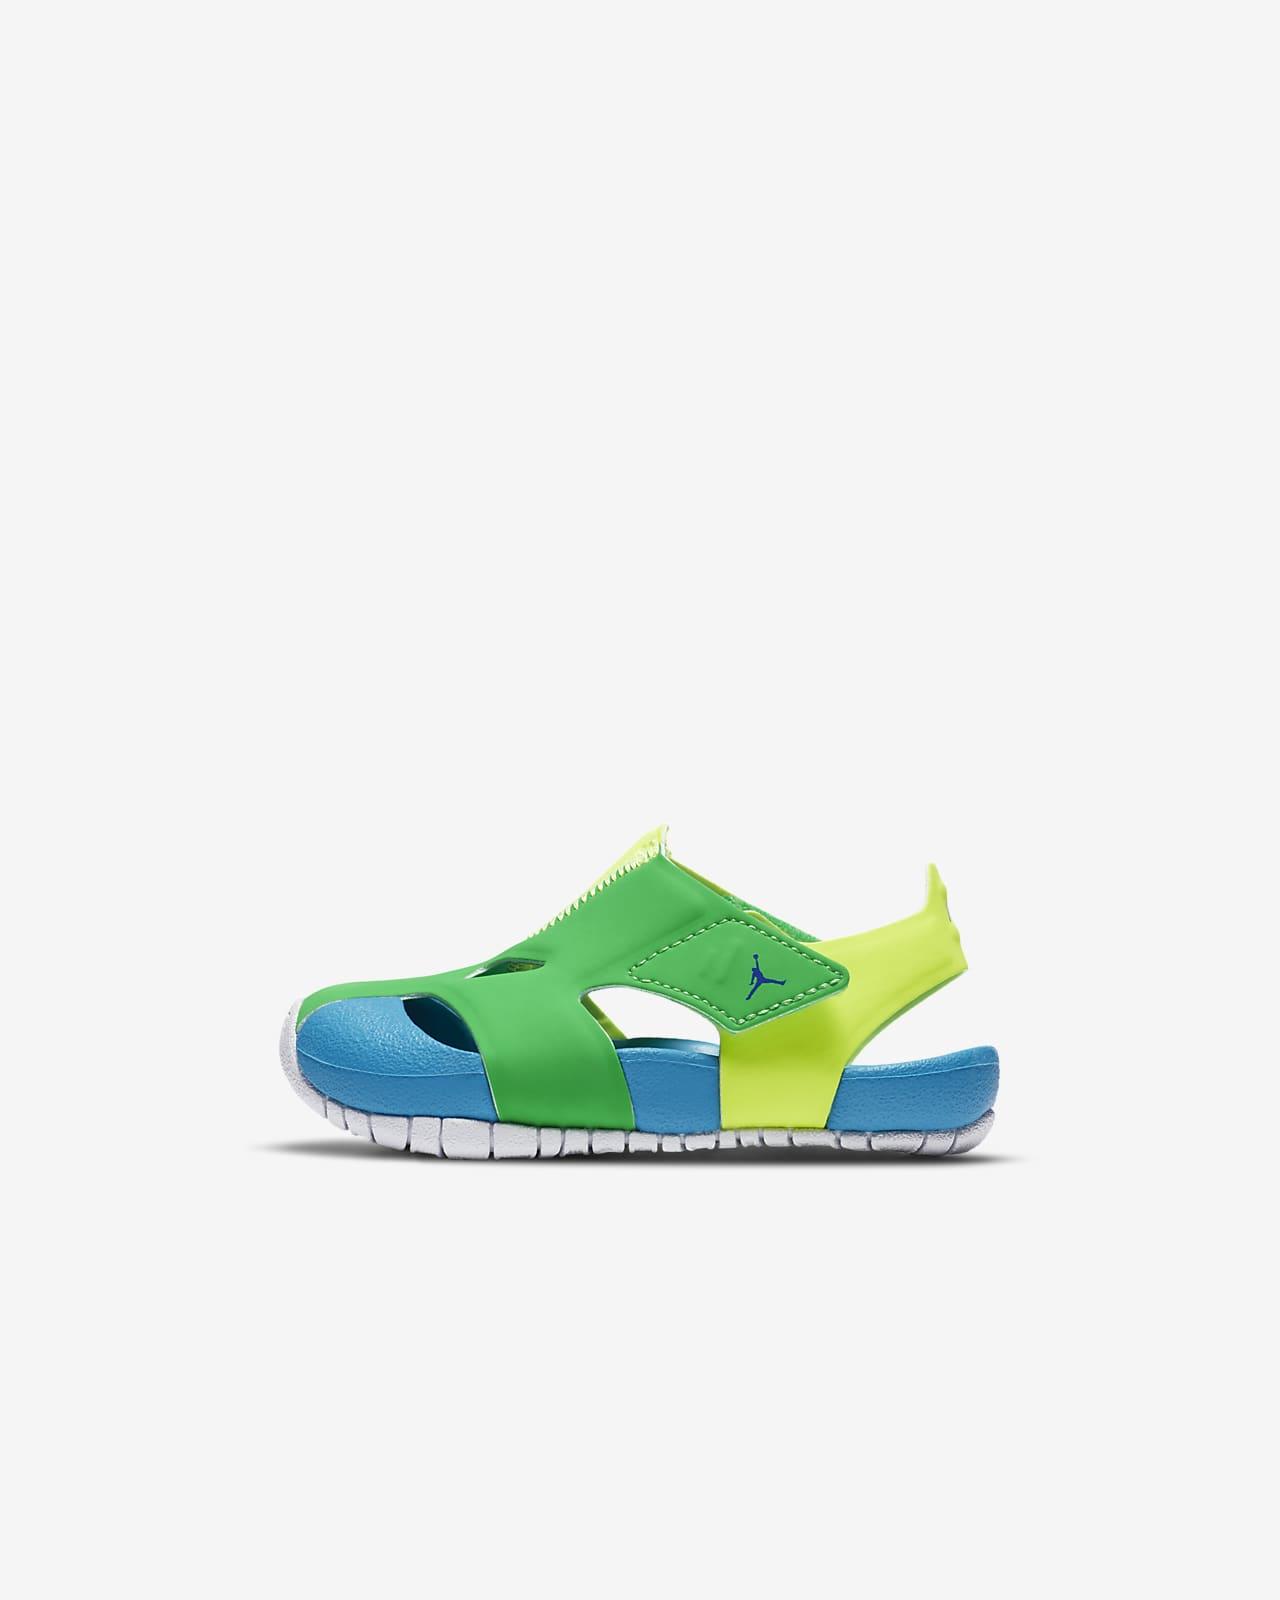 Jordan Flare sko til sped-/småbarn